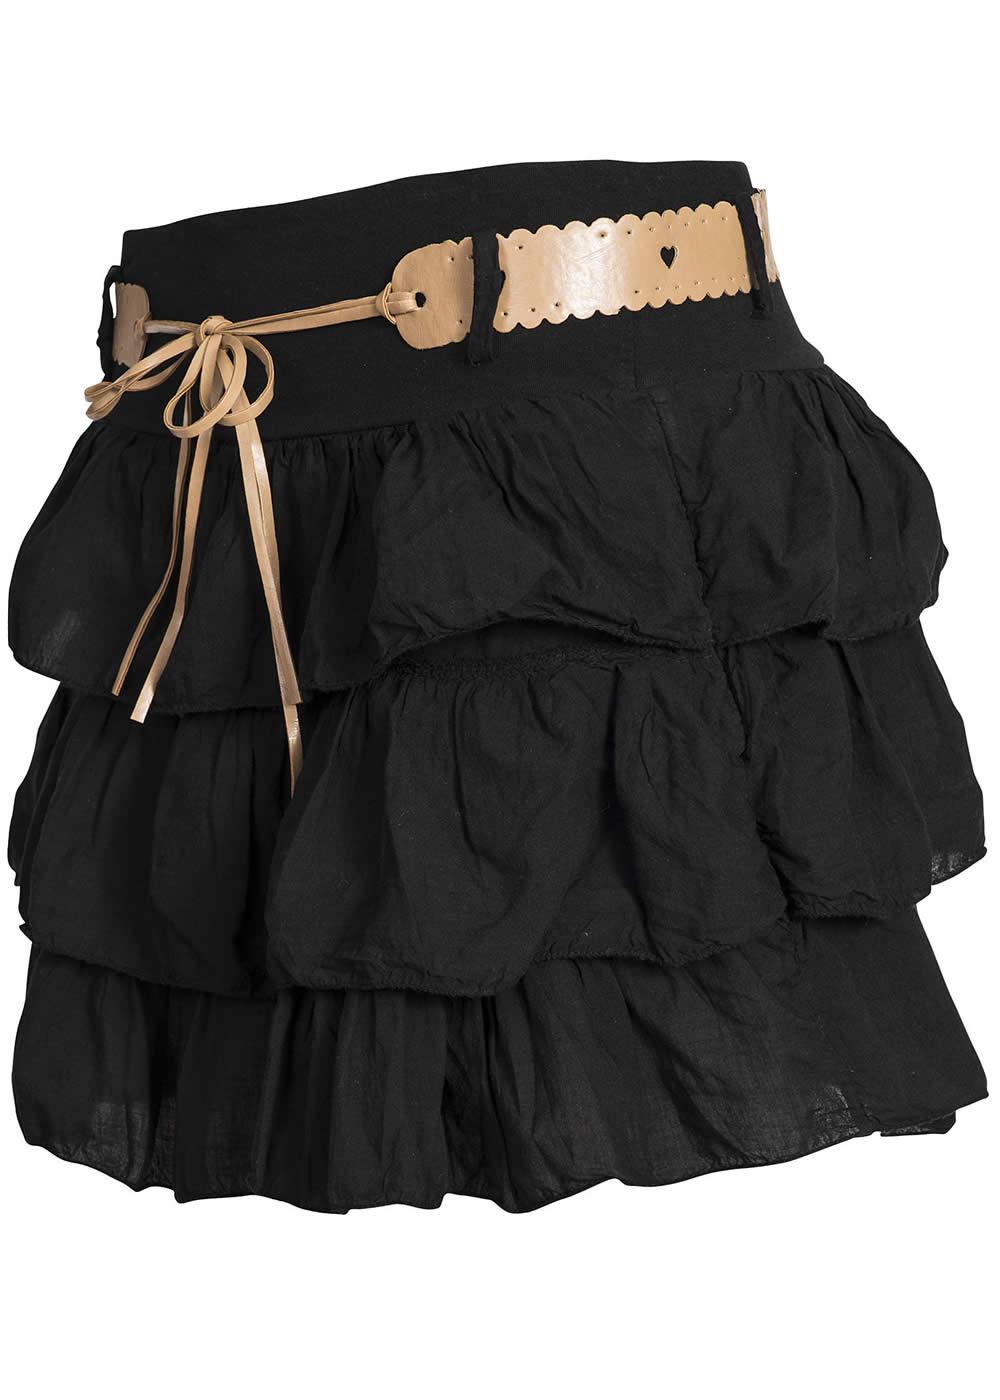 madonna sommer rock mit g rtel breitem bund 4 1393i d schwarz 77onlineshop. Black Bedroom Furniture Sets. Home Design Ideas